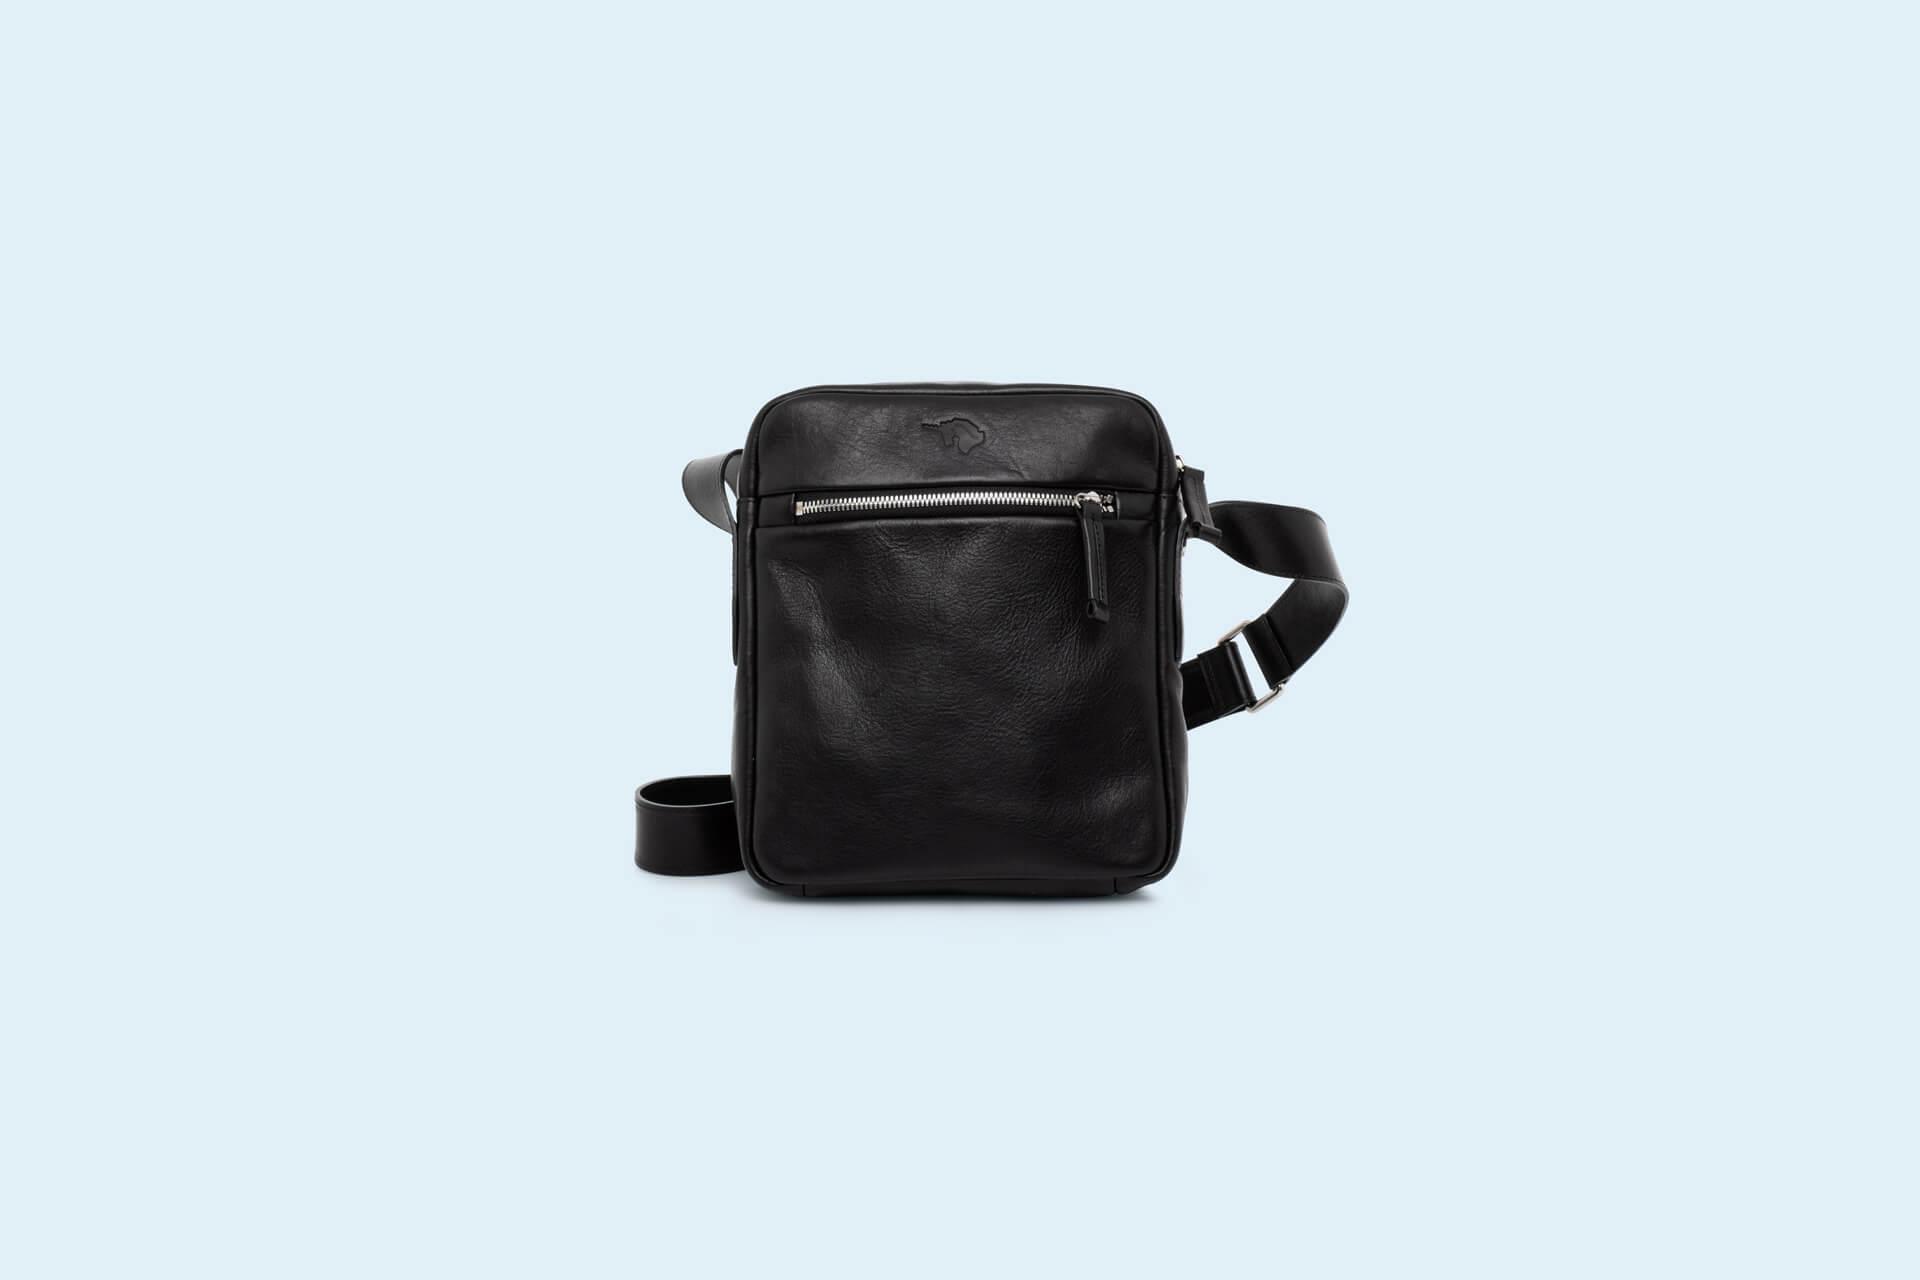 e956b279018f0 Skórzana listonoszka męska - Nonconformist Messenger small bag black ...